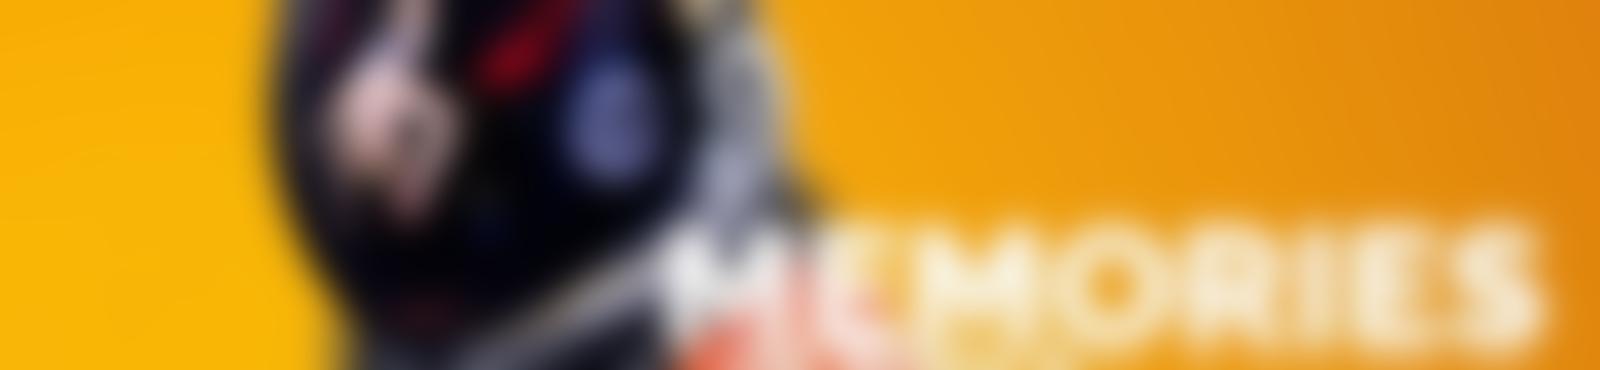 Blurred e96f3dc0 6d90 42b0 ab86 5cec6bfb97ab